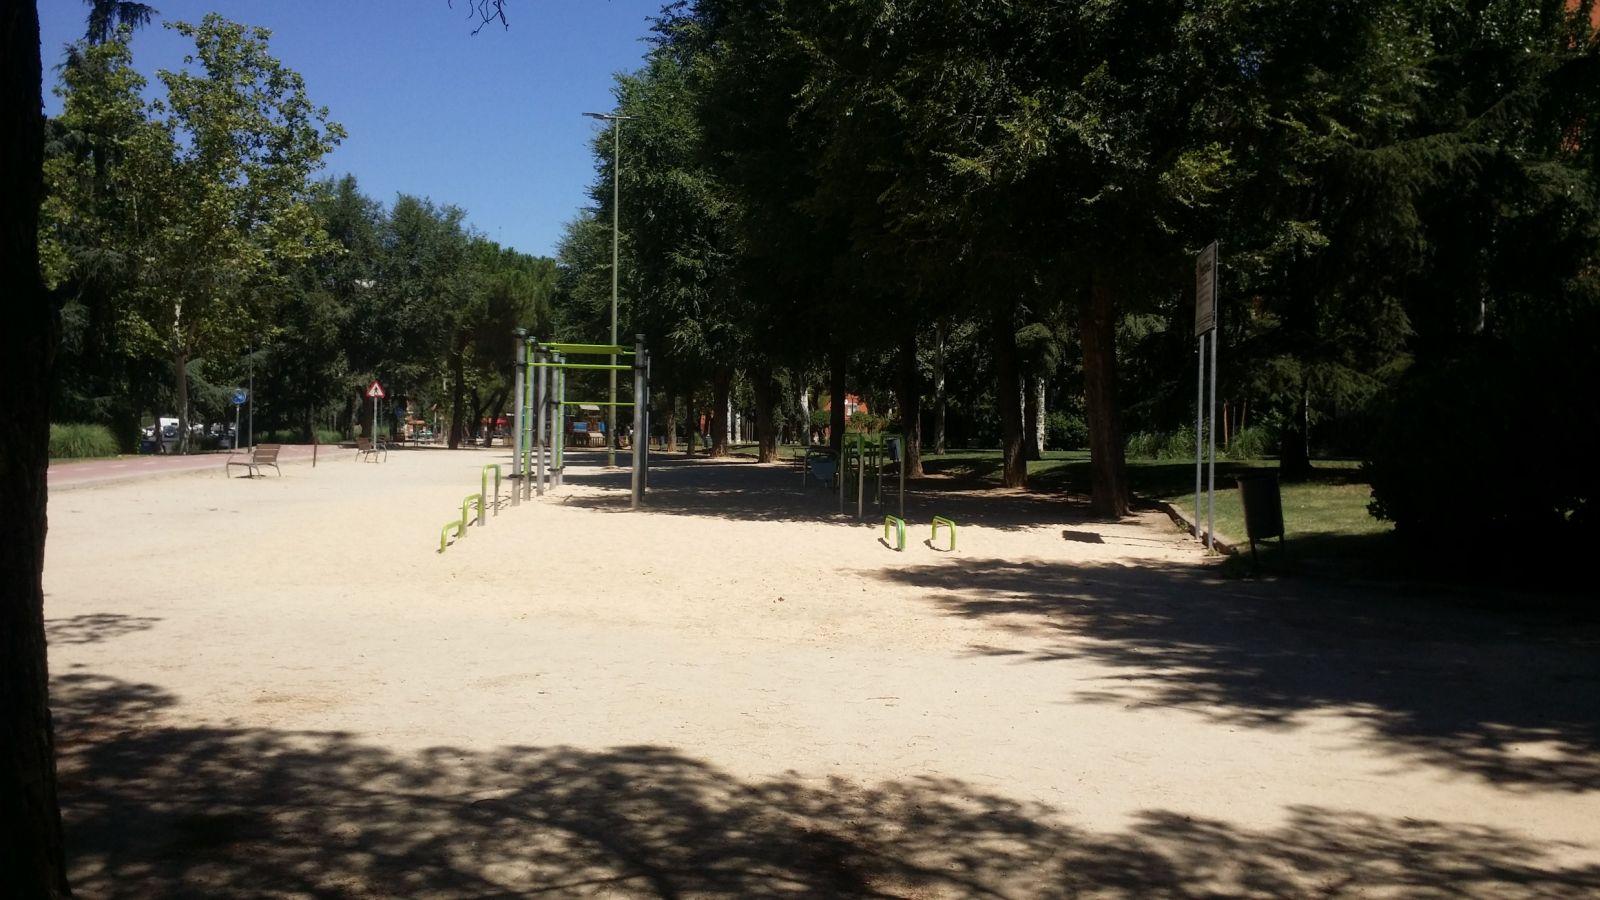 zona workout certificada ayuntamiento mostoles